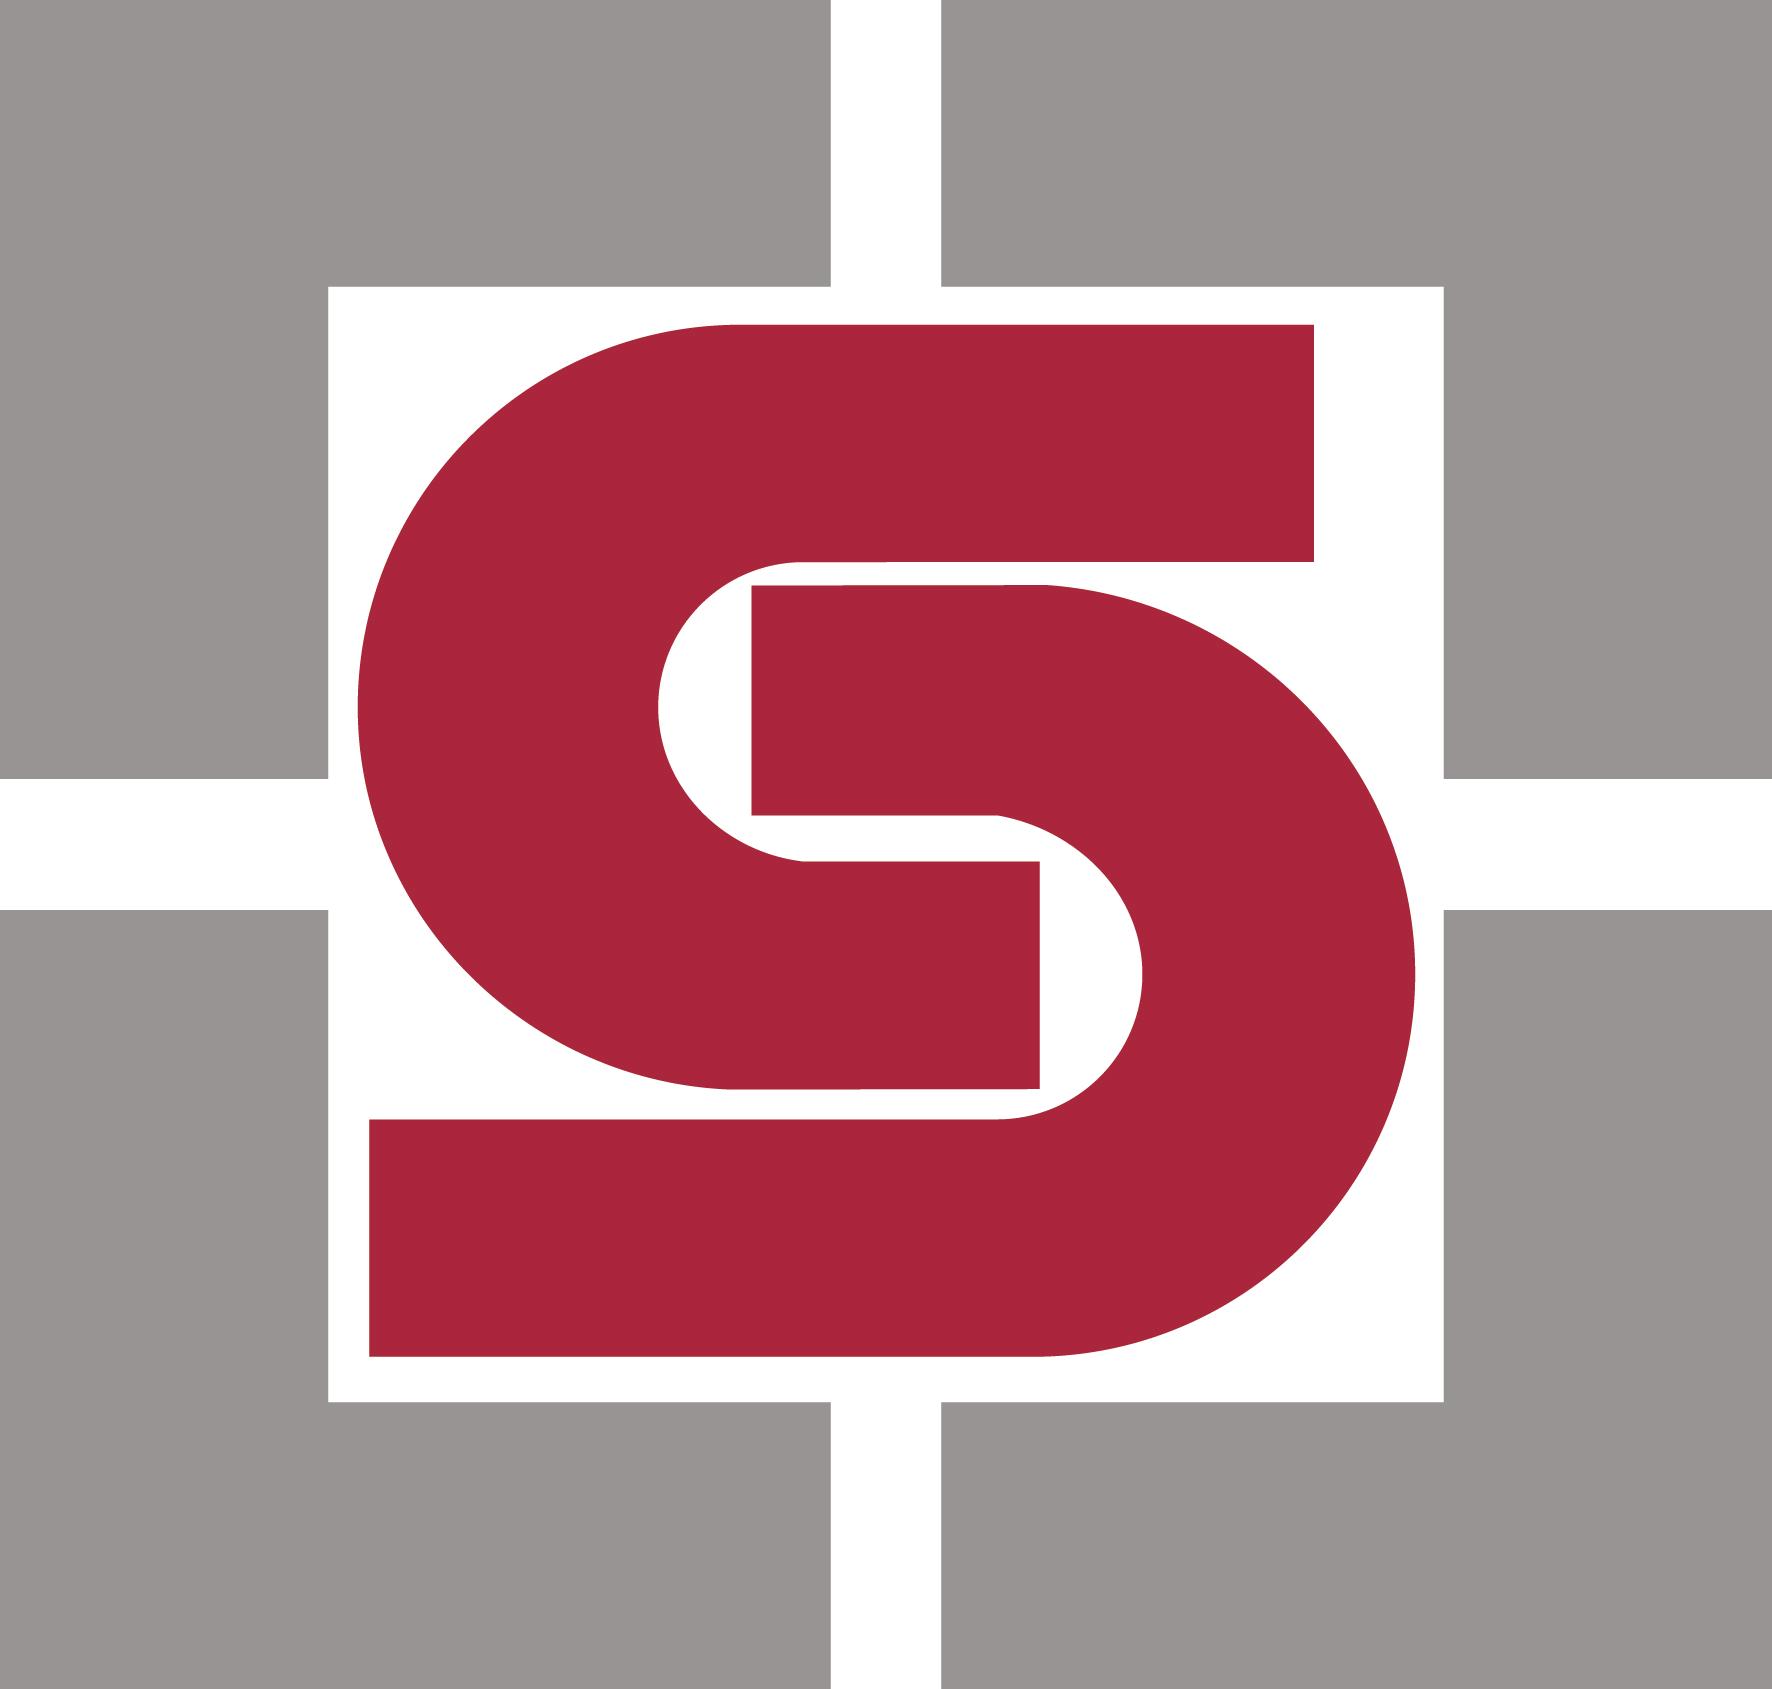 Satmell-logo-image